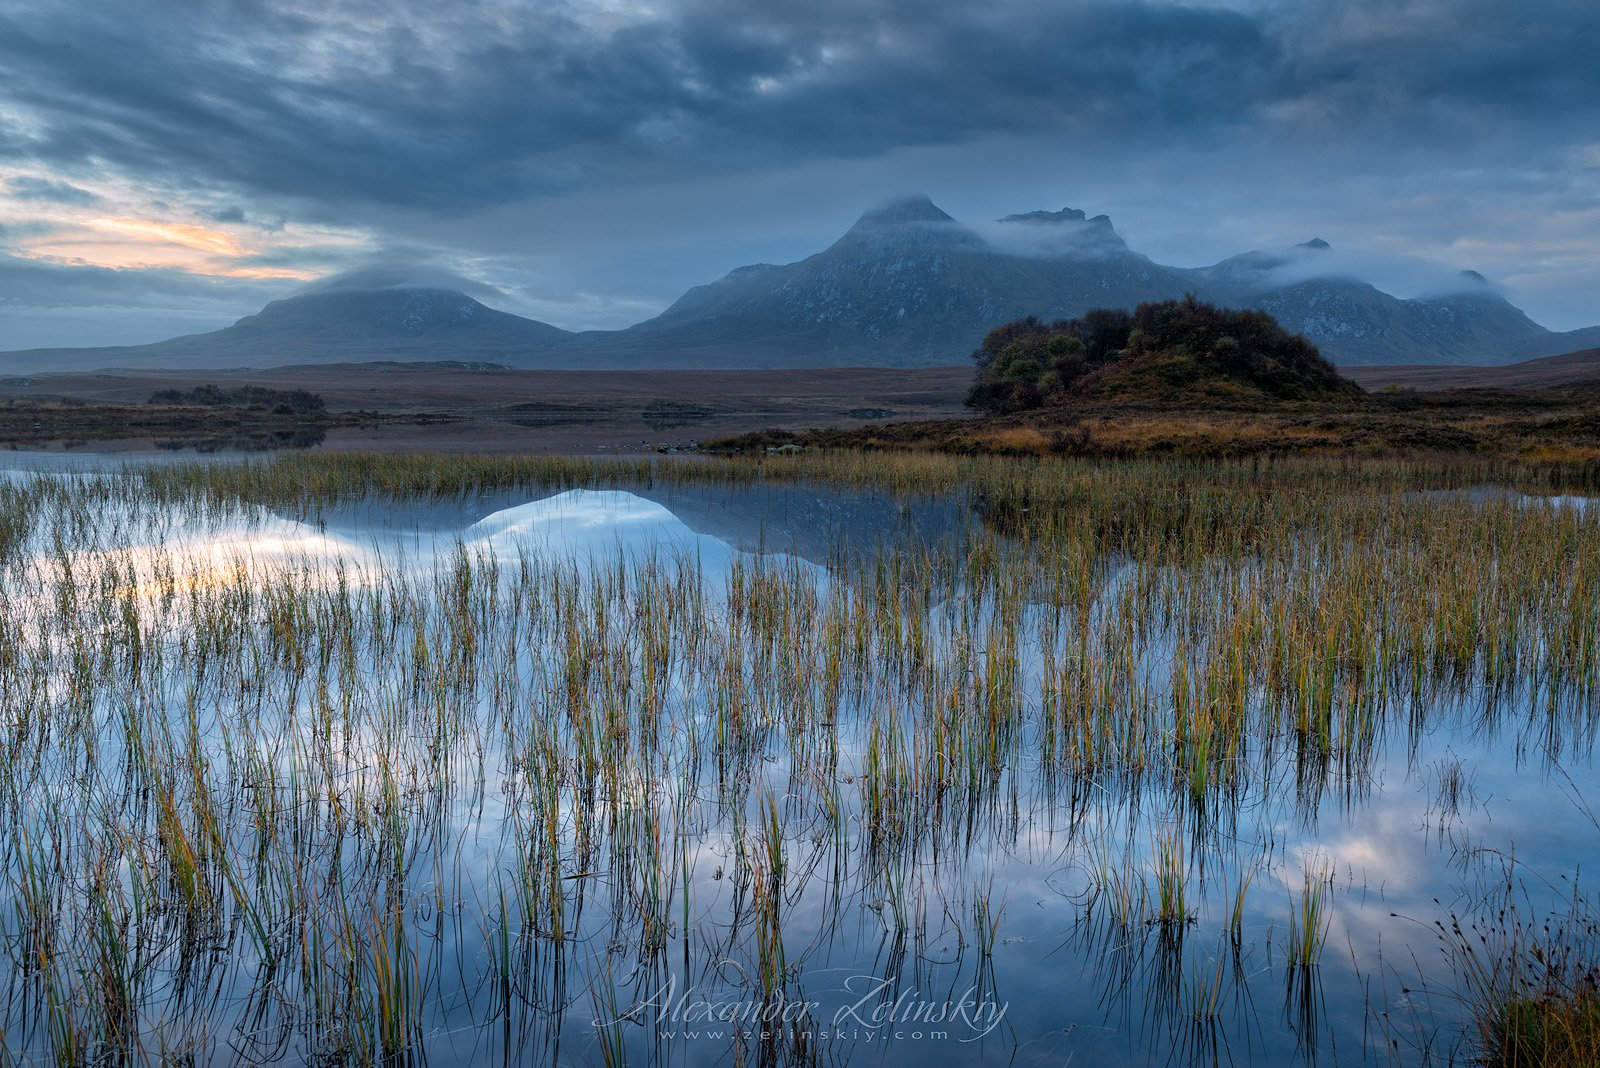 озеро, рассвет, шотландия, Alex Mimo